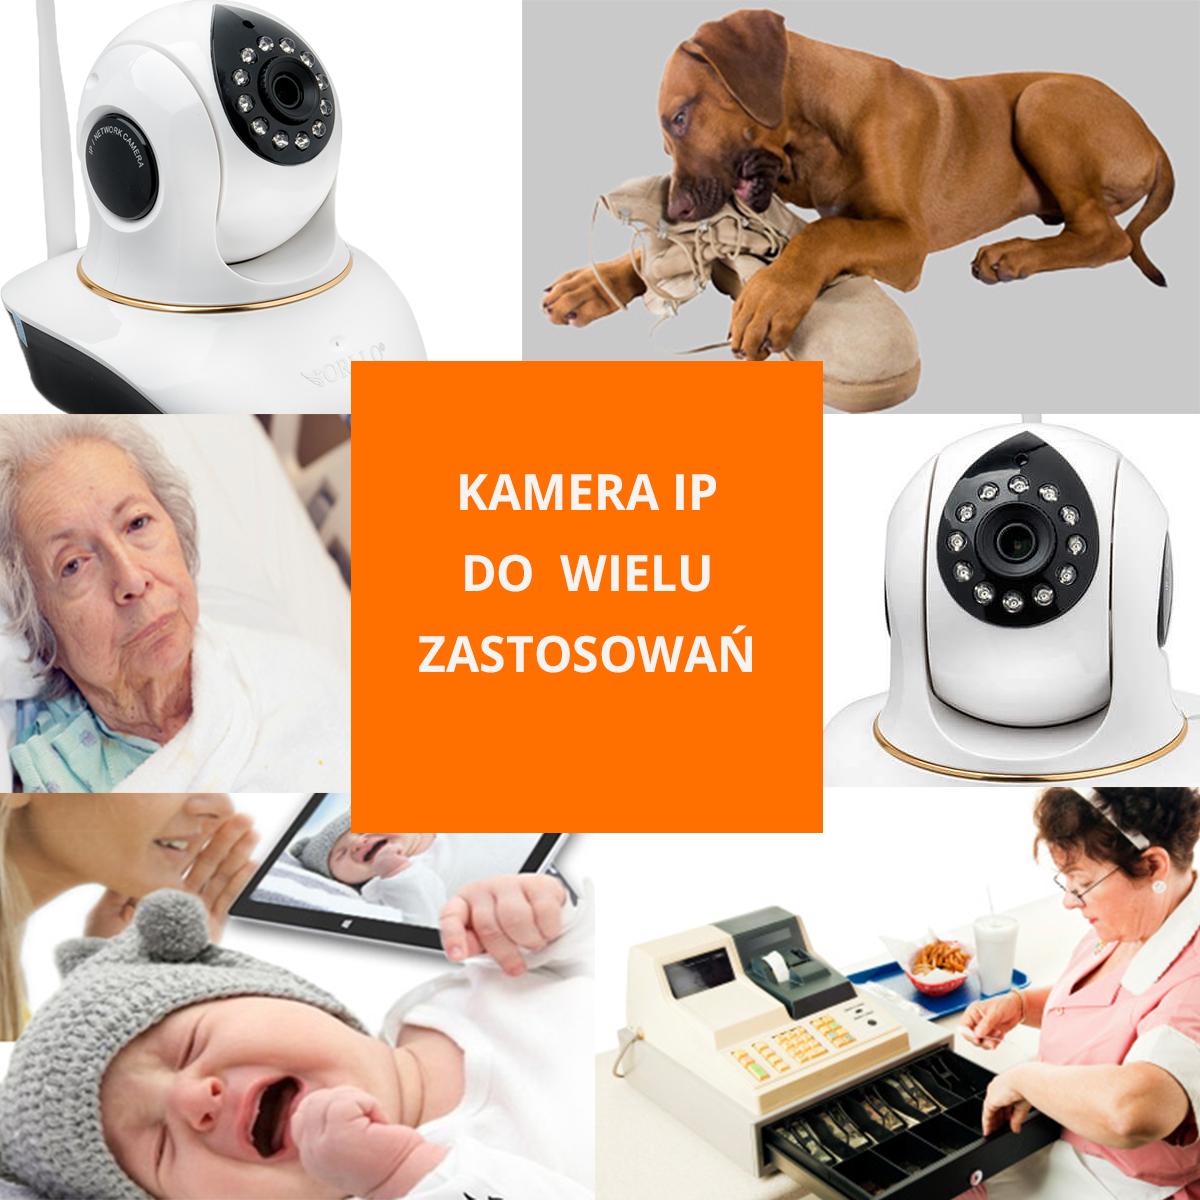 Kamera-domowa-zastosowanie-orllo-pl